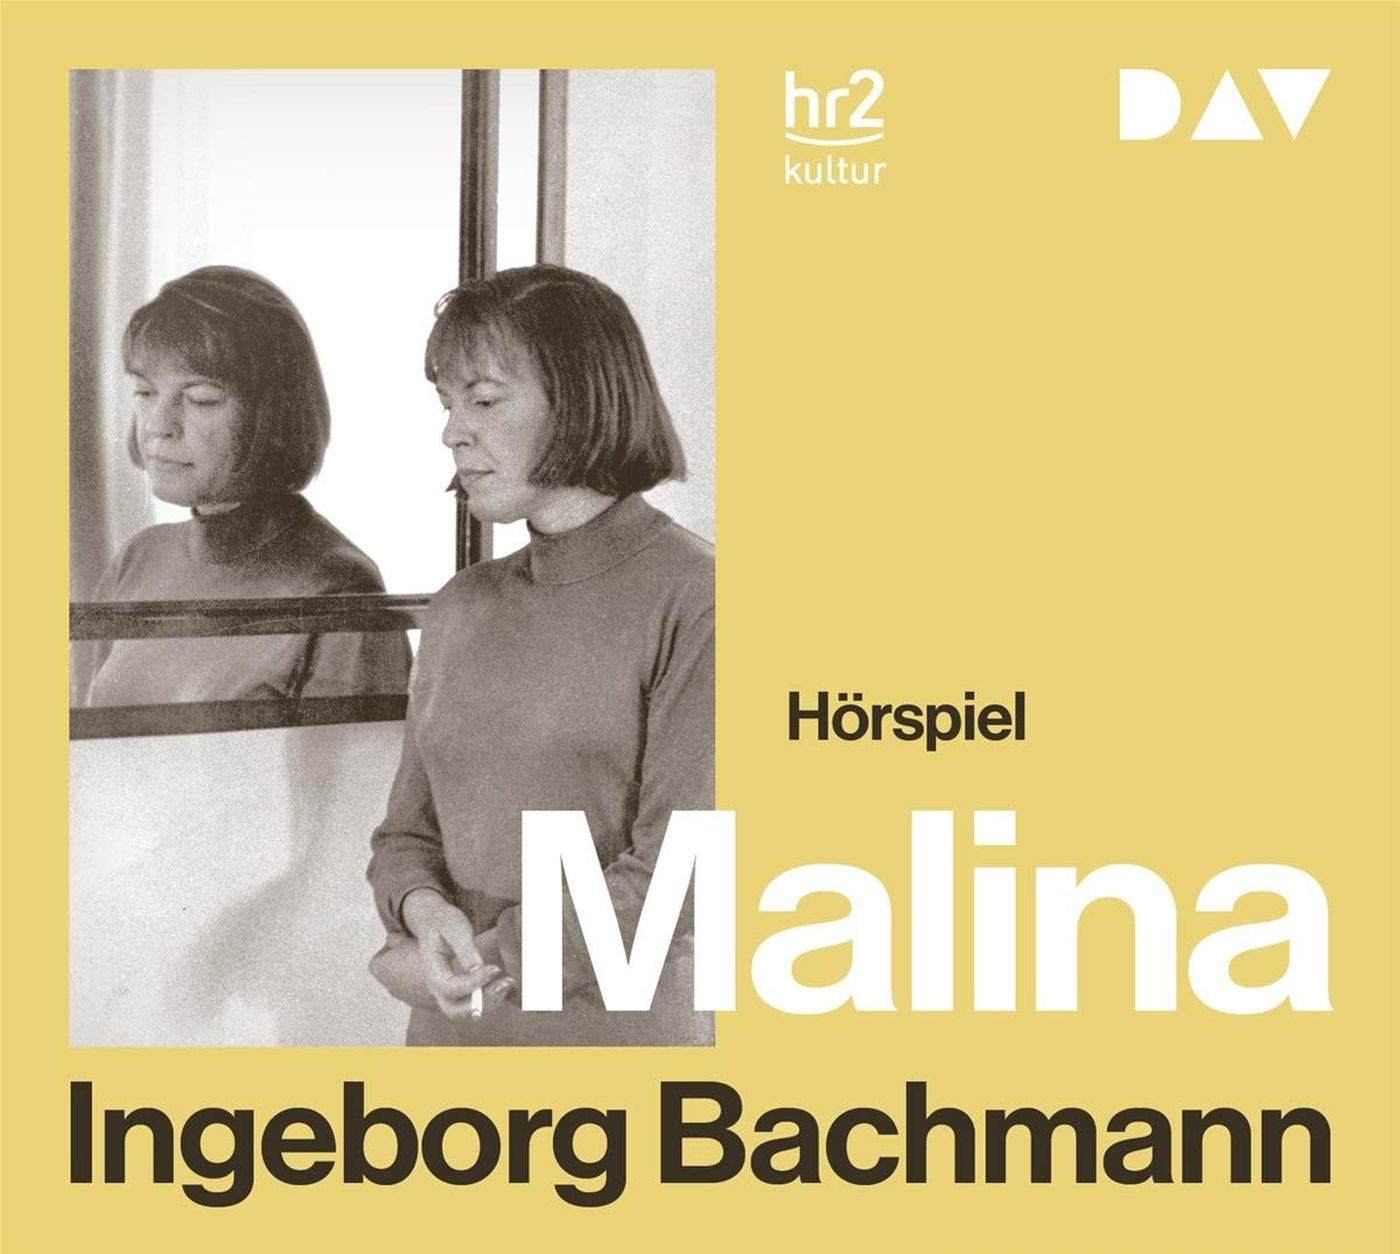 Ingeborg Bachmann - Malina (Hörspiel)